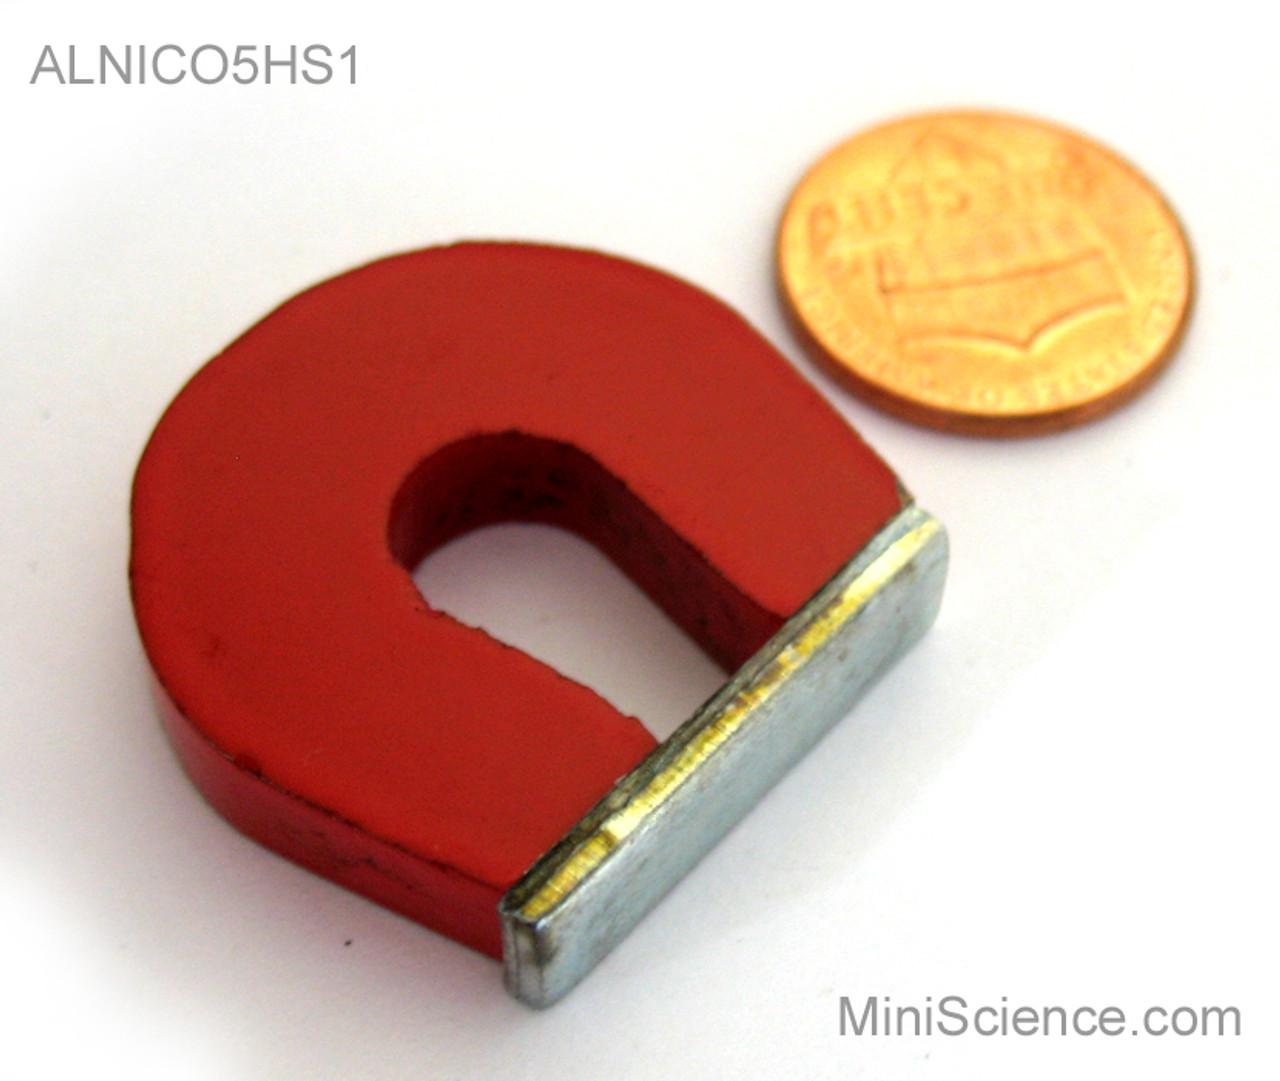 ALNICO horseshoe magnet, 1-inch, painted